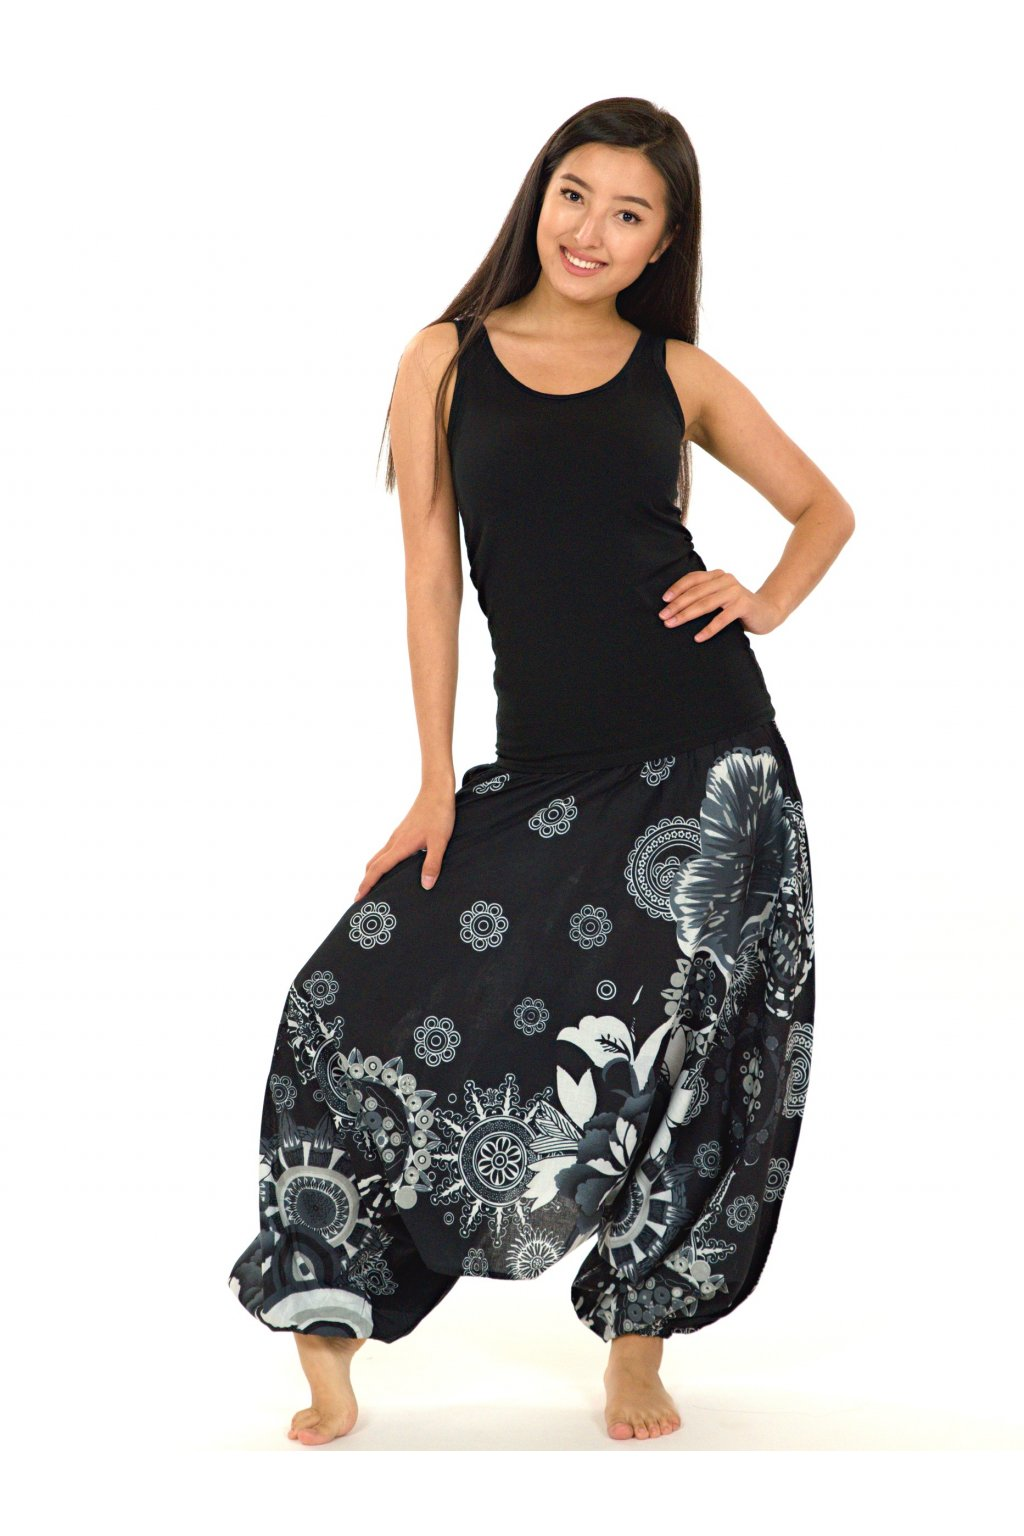 Kalhoty-šaty-top 3v1 Wailea - černé s bílou